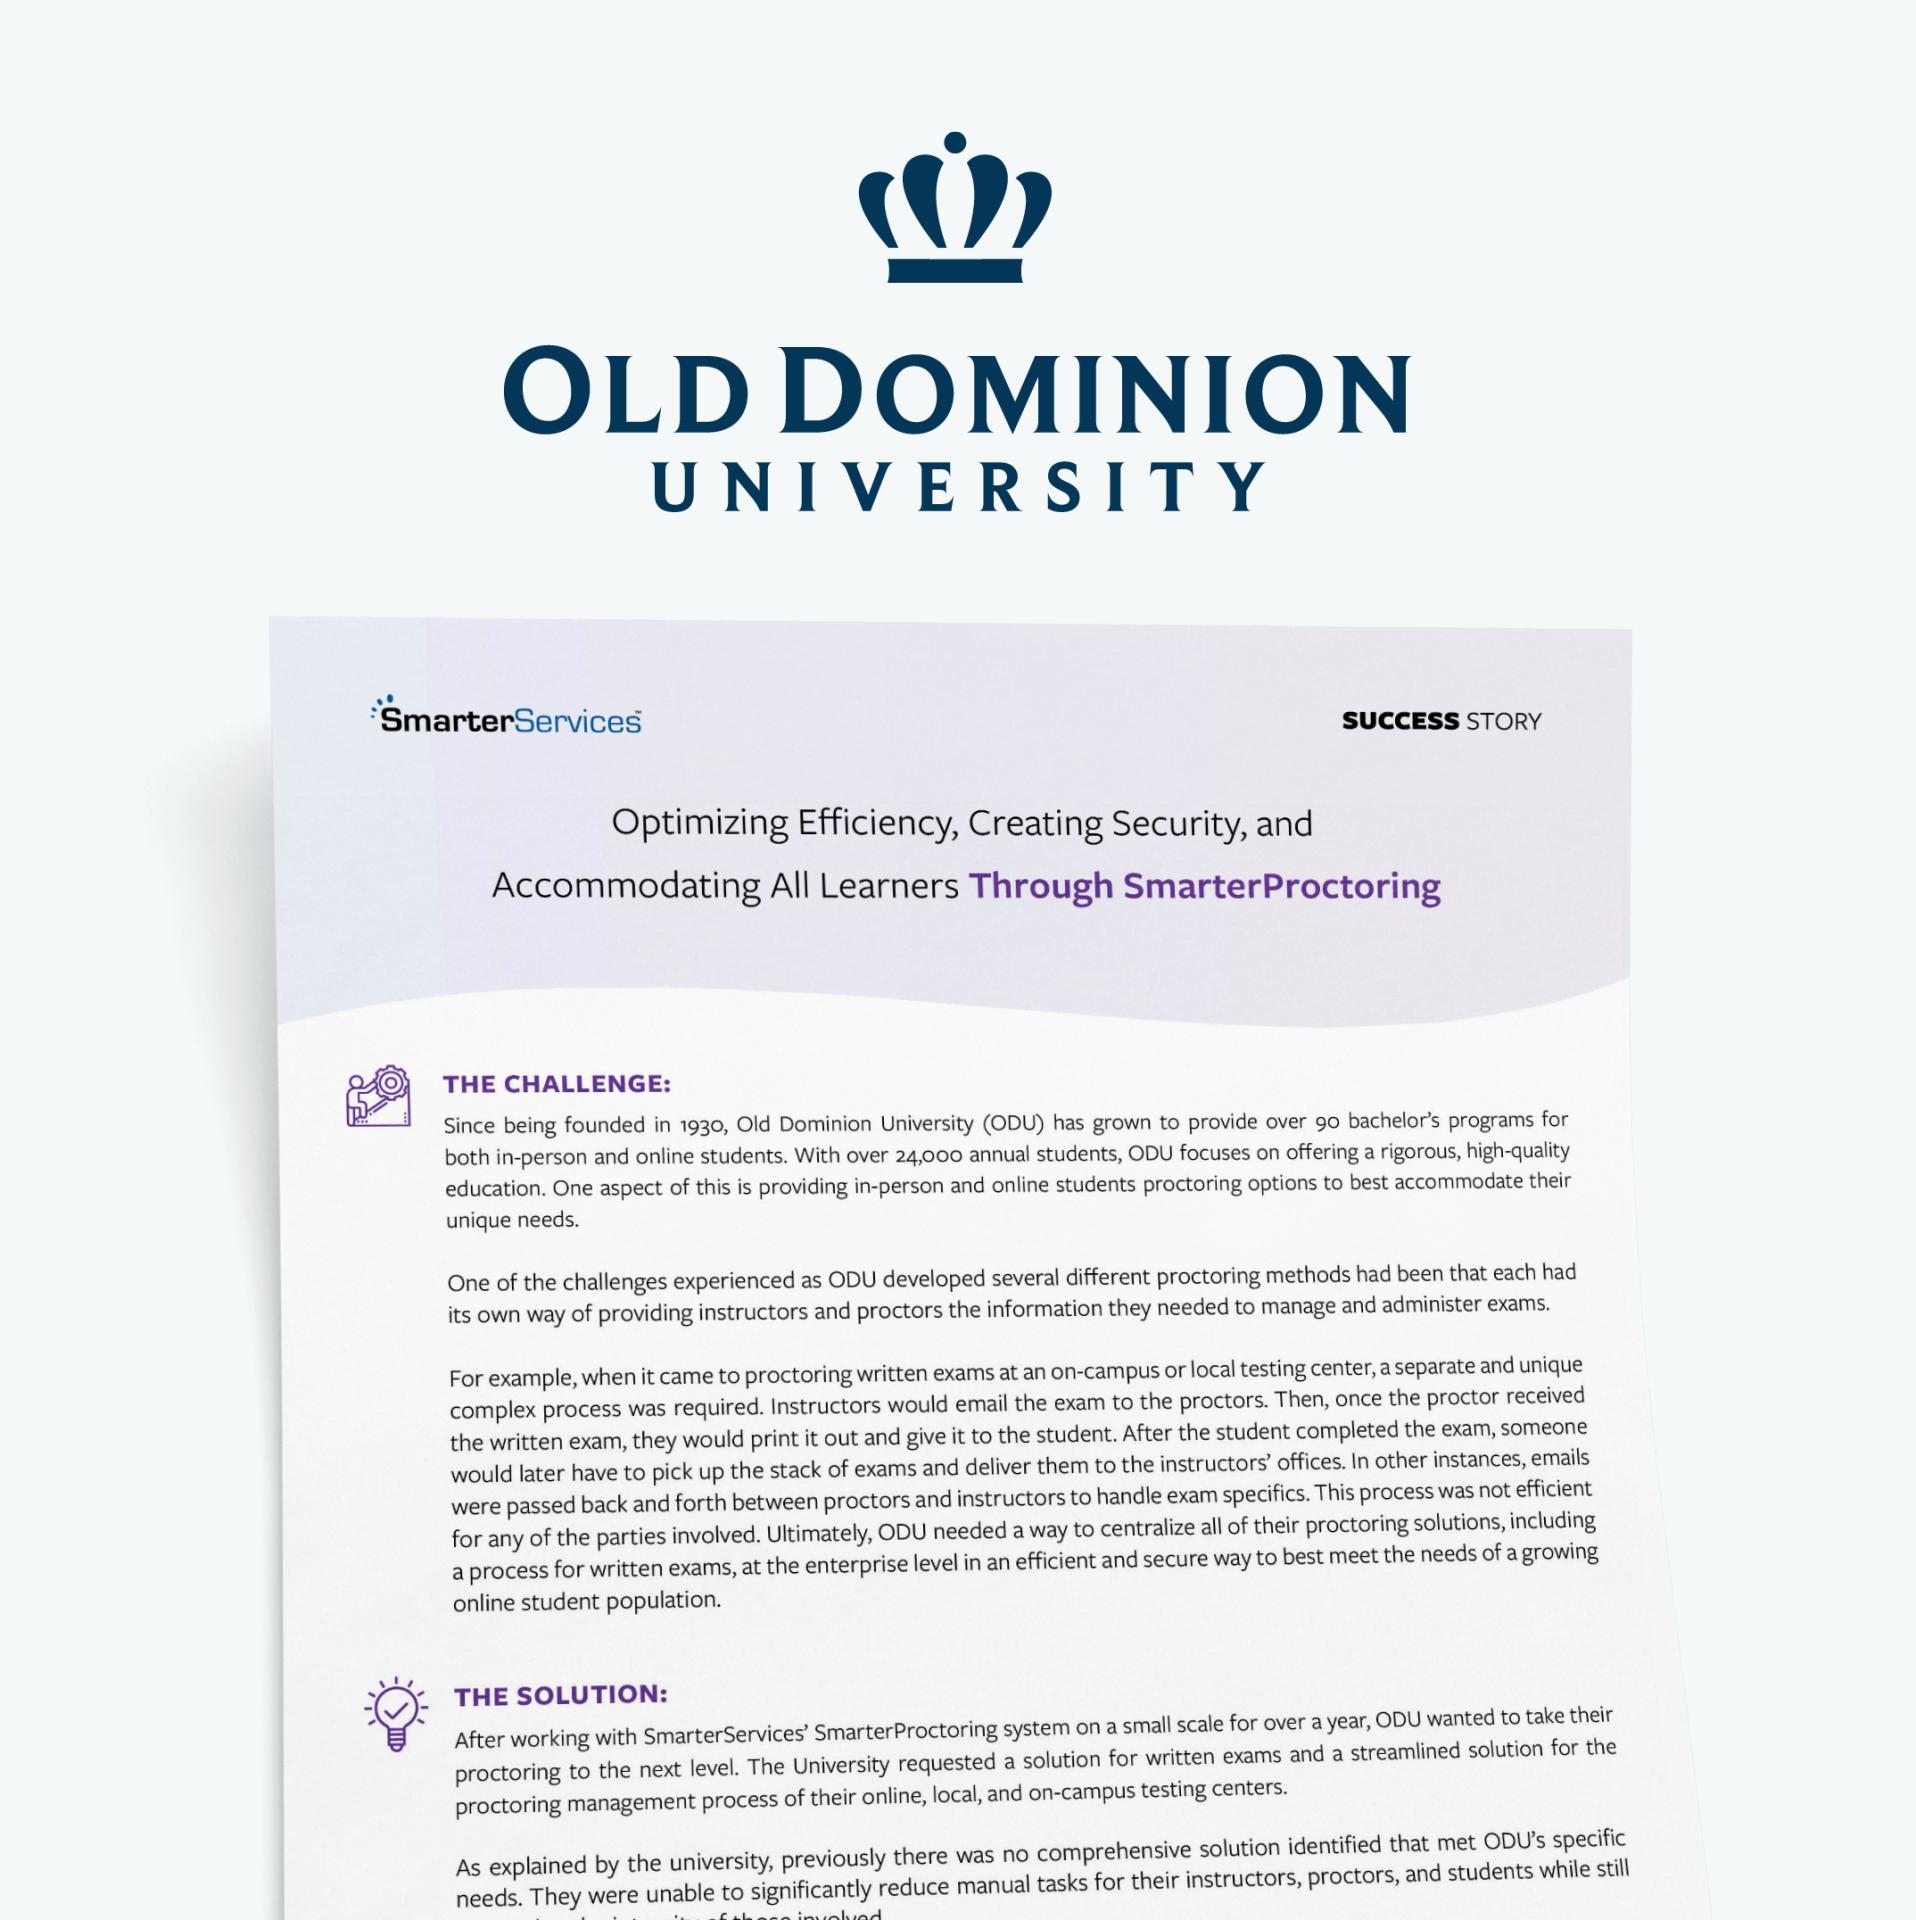 Old Dominion University Case Study